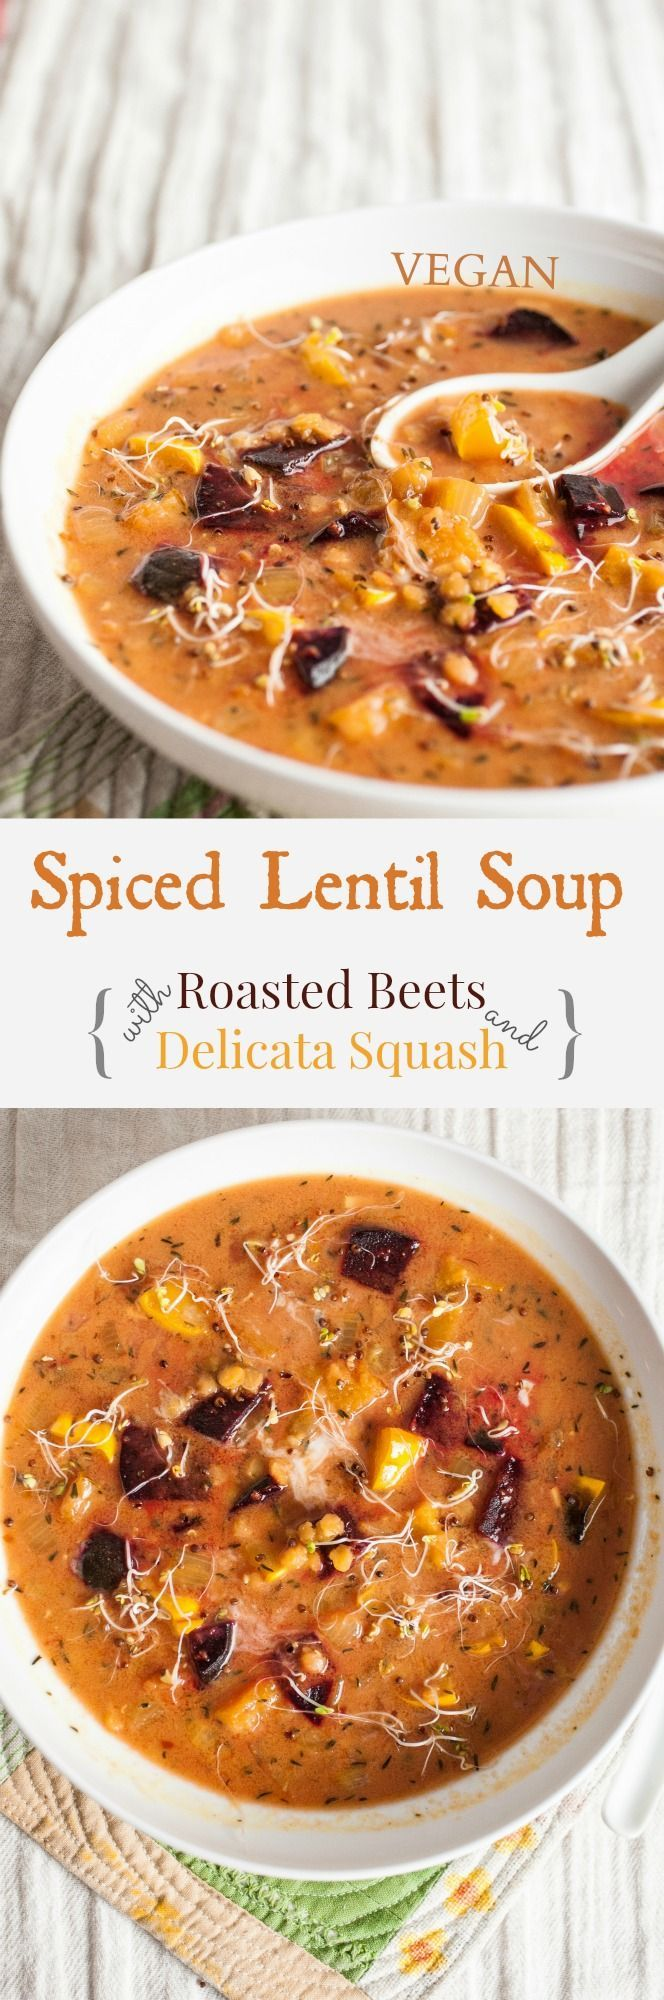 Spiced Lentil Soup with Roasted Squash & Delicata Squash